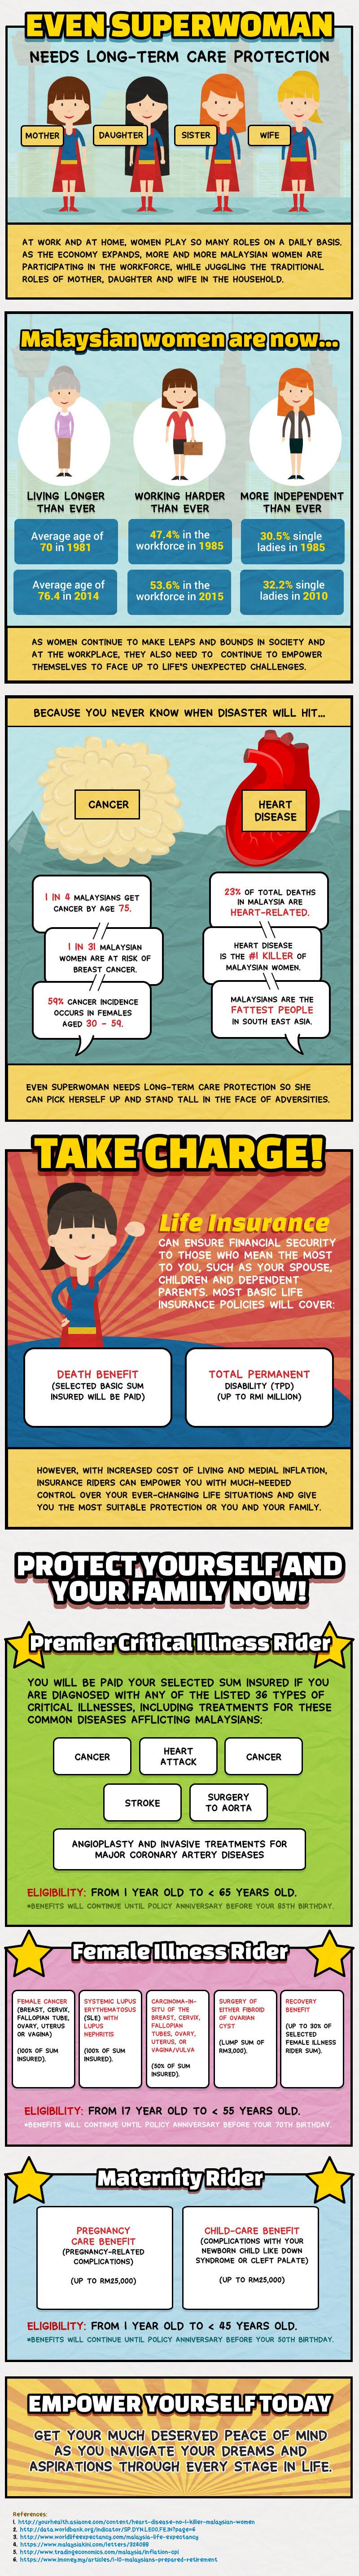 20160205_[Client_Etiqa]_Medical_insurance_for_Women (1) (1)